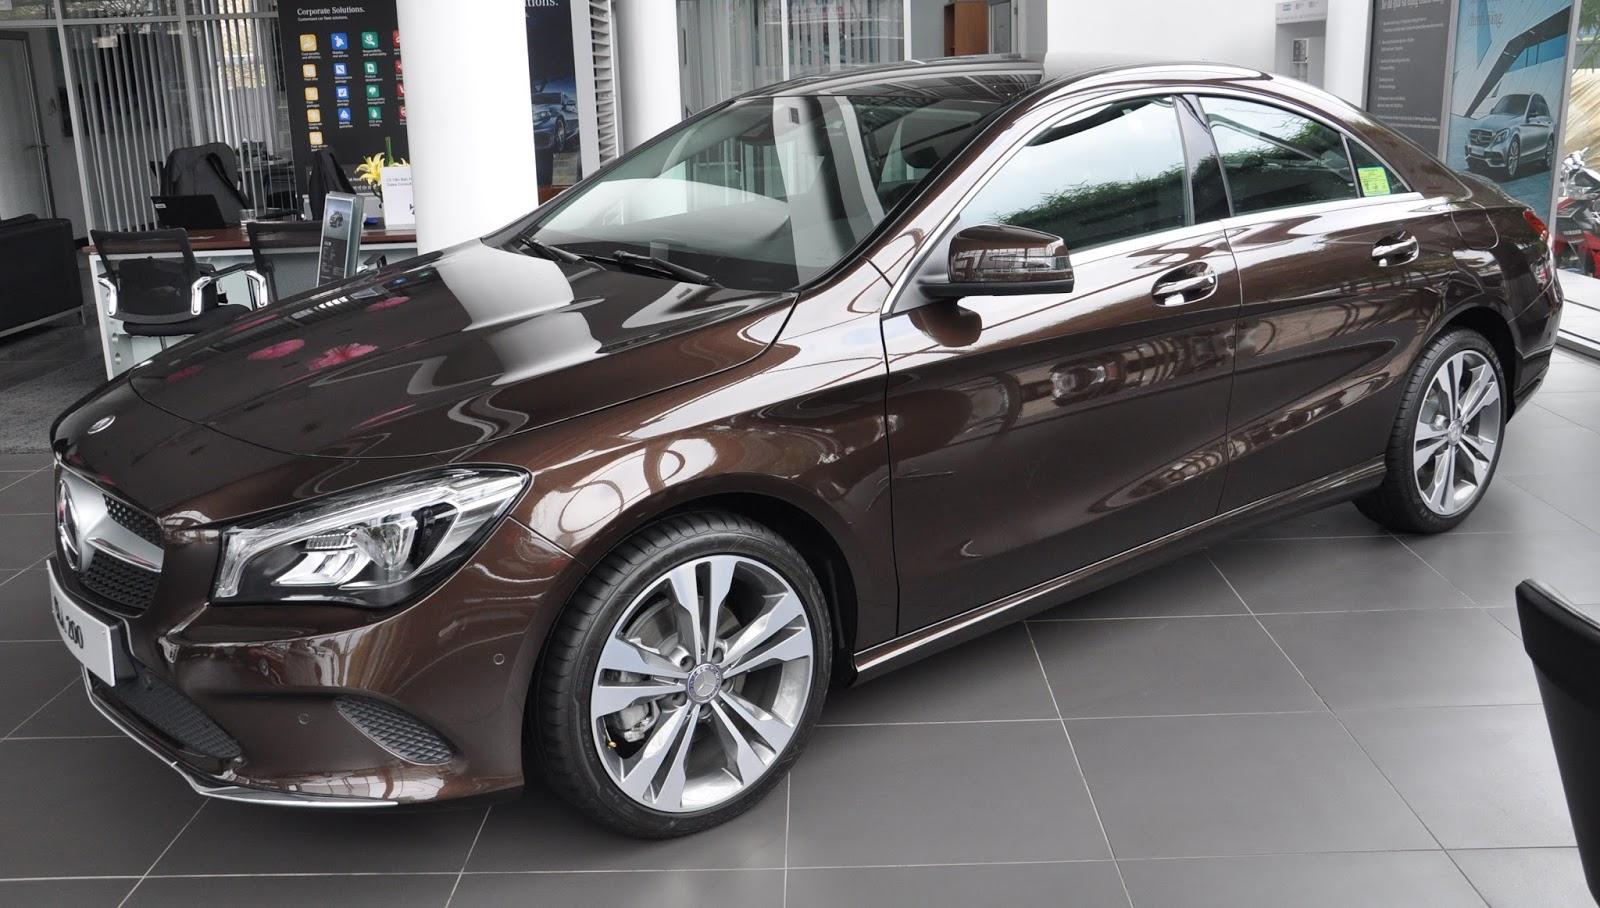 Xe Mercedes Benz CLA 200 New Model màu nâu 02